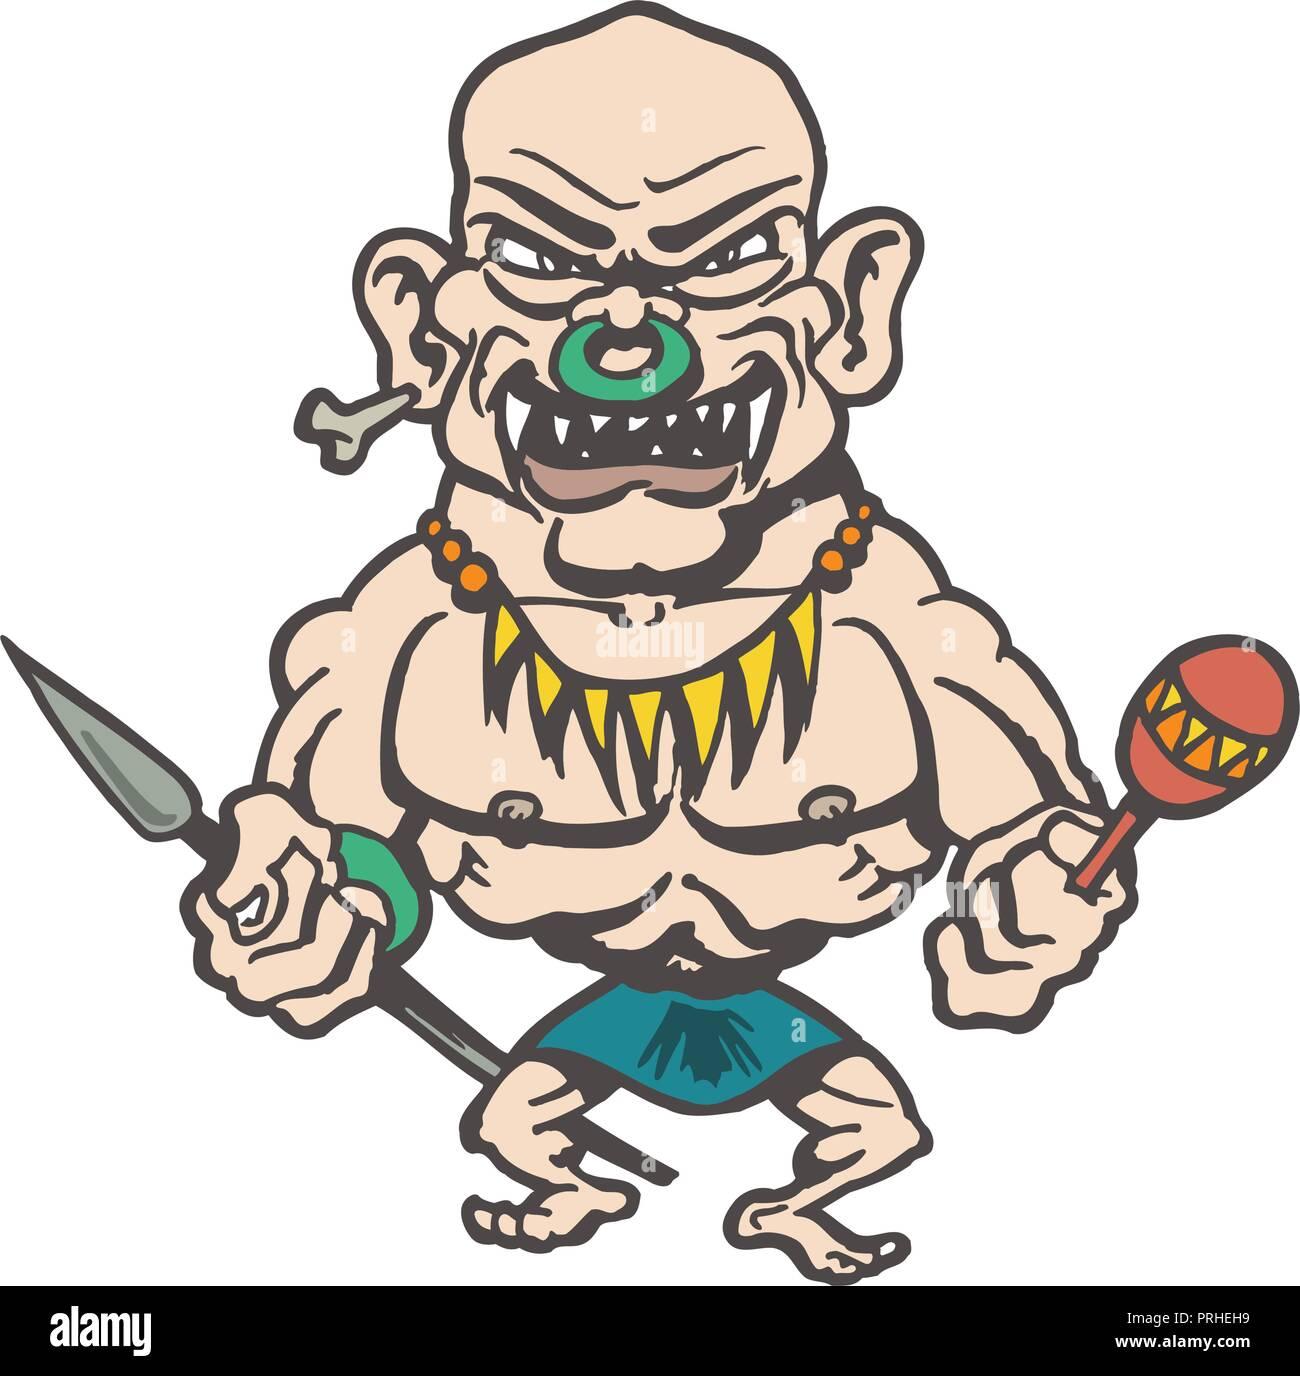 tribes of inland cartoons. Cartoon character Vector Illustration. - Stock Vector